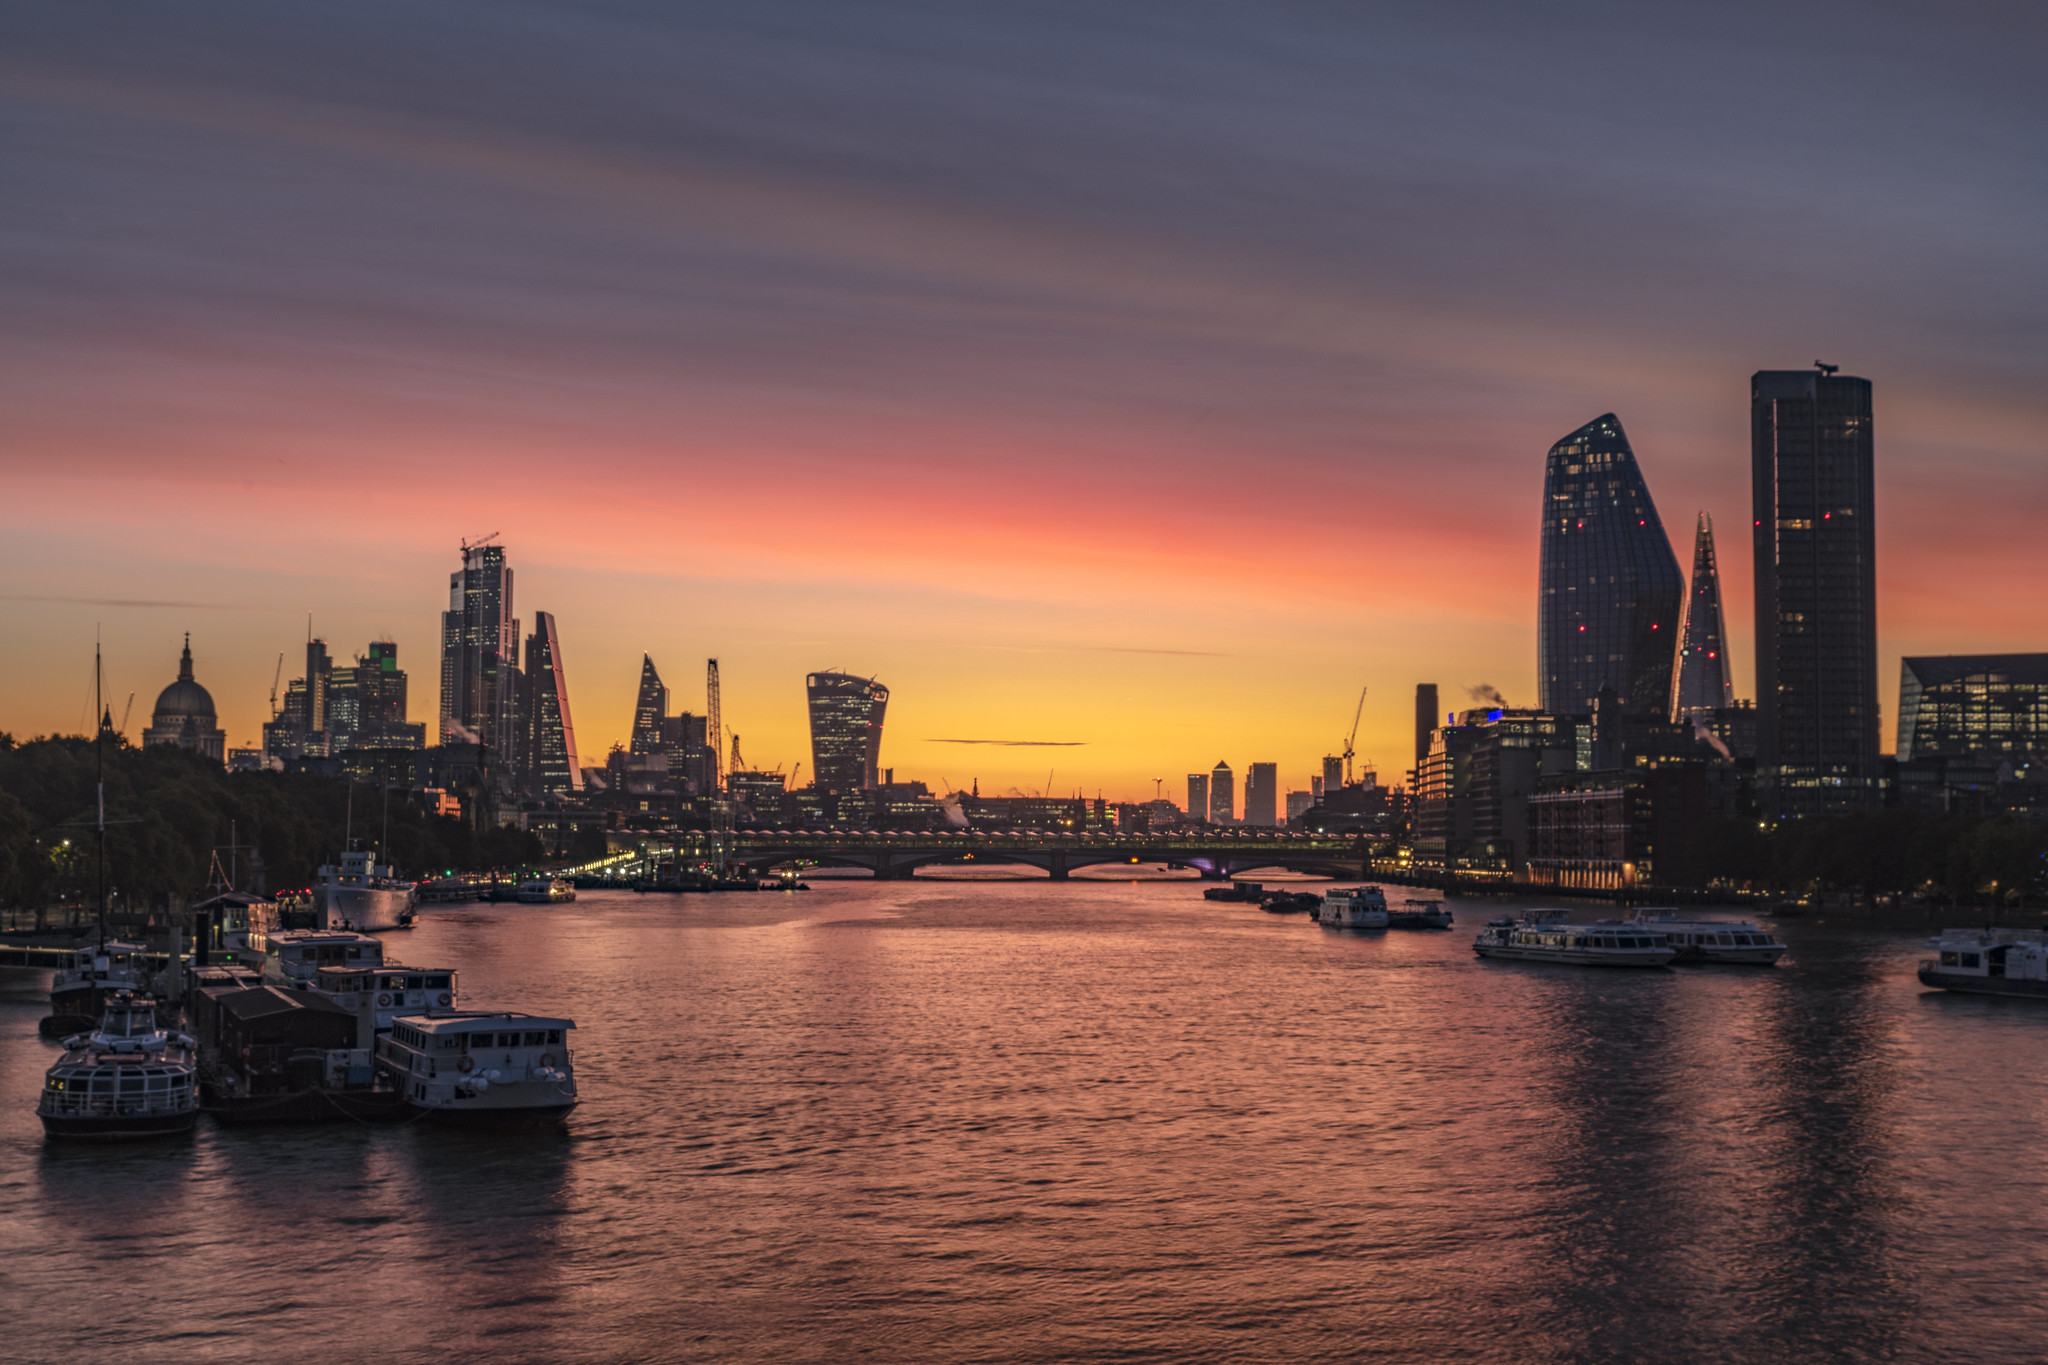 Thames from Waterloo Bridge, London by Beartomcat.jpg